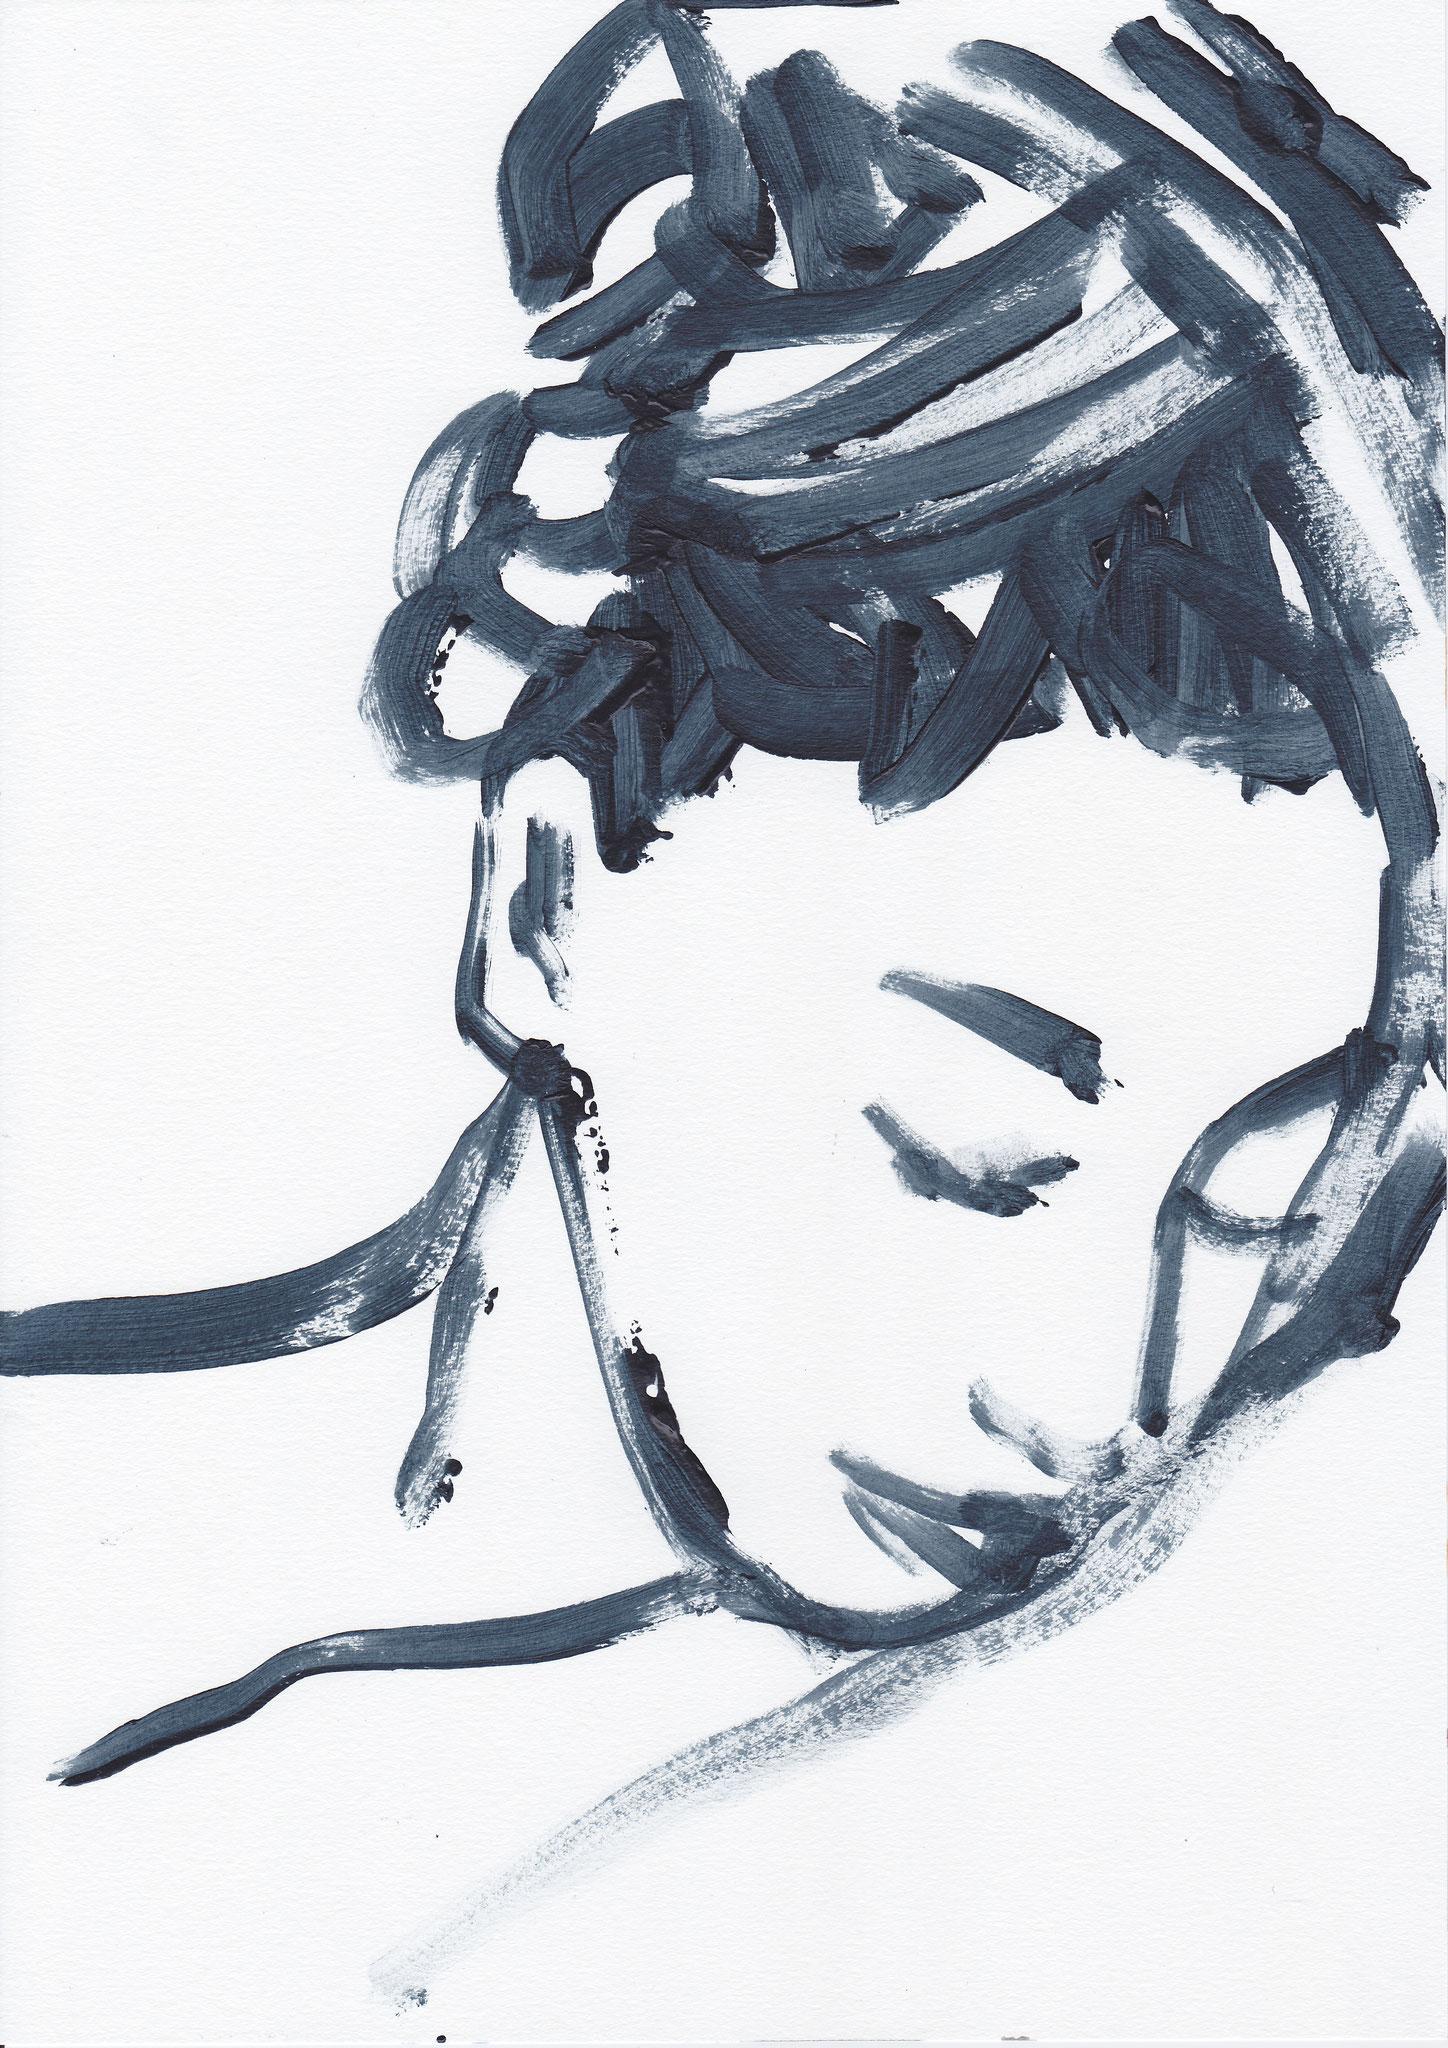 057 , acrylic on paper , 29.7 x 21cm , Selina Saranova